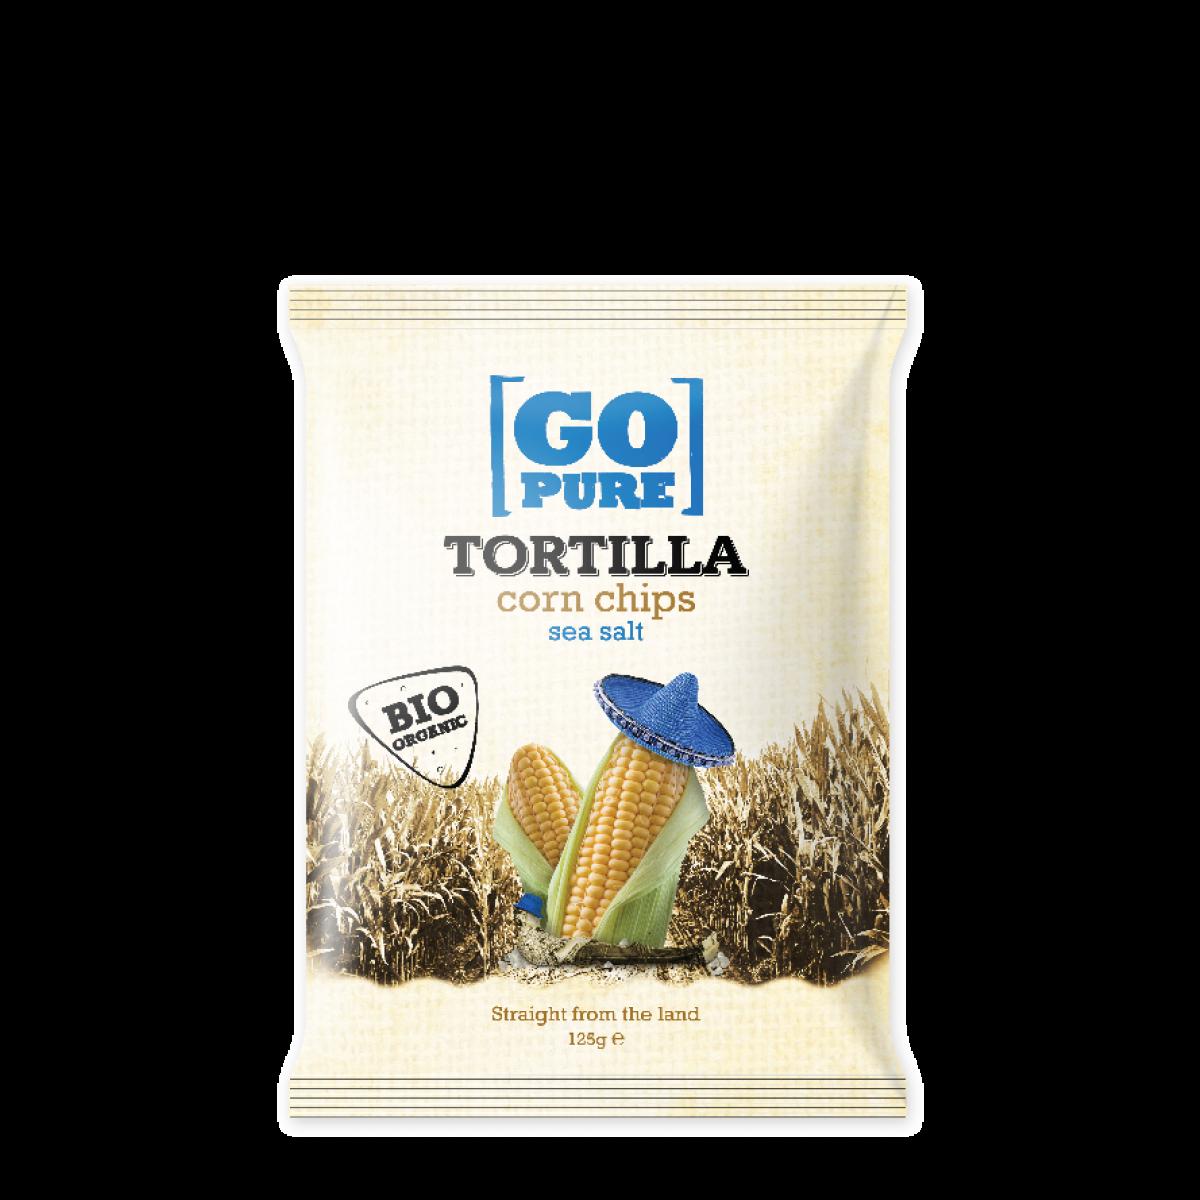 Tortilla Corn Chips Sea Salt